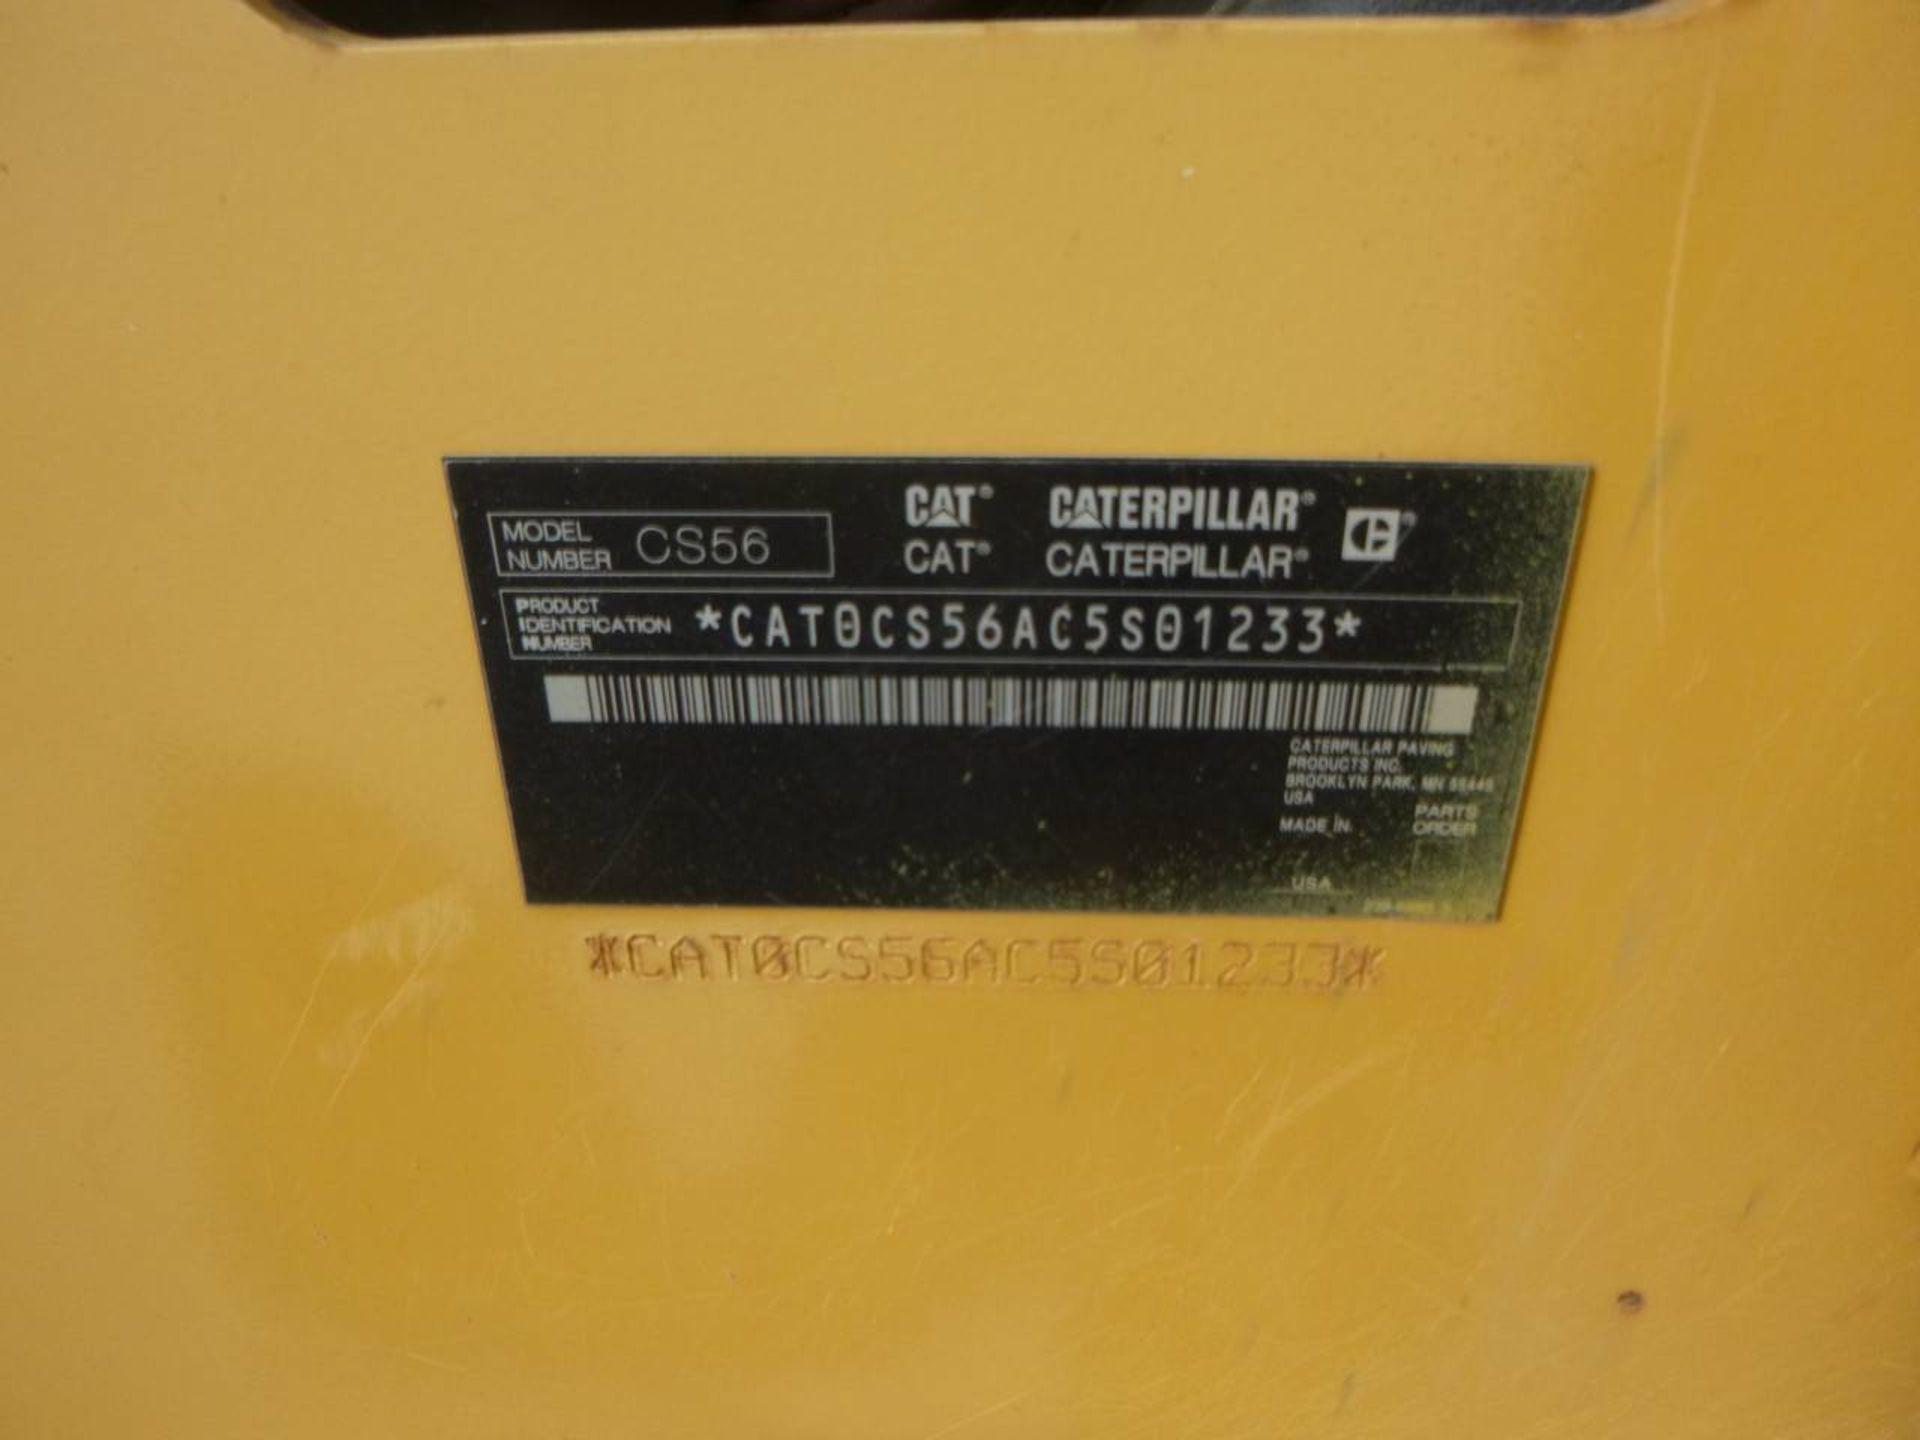 2011 Caterpillar CS56 Compactor - Image 9 of 9